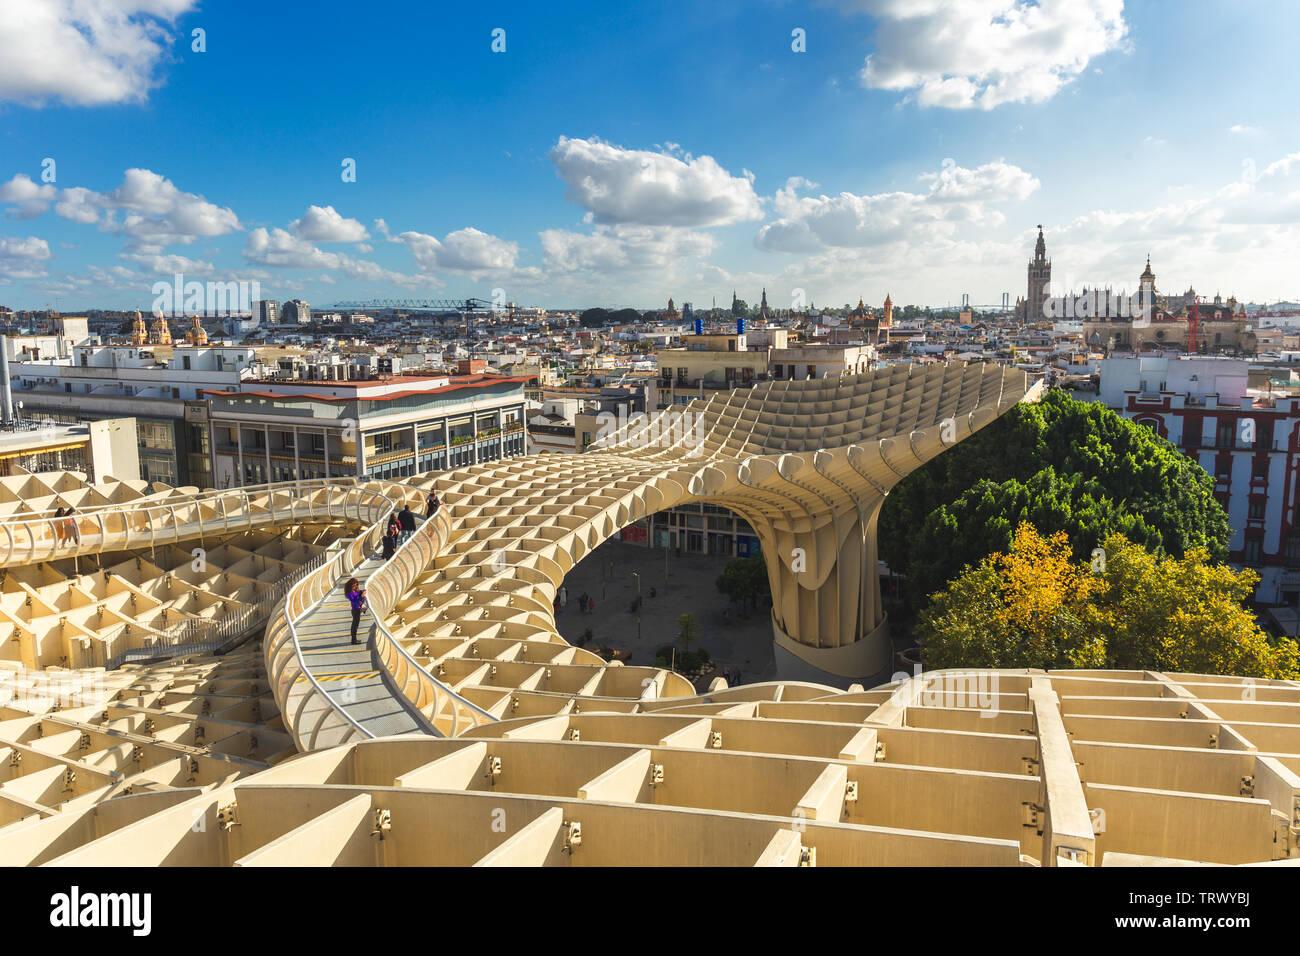 Spain, Andalusia, Sevilla, The Metropol Parasol in Plaza de la Encarnacion, better known as Las Setas Stock Photo